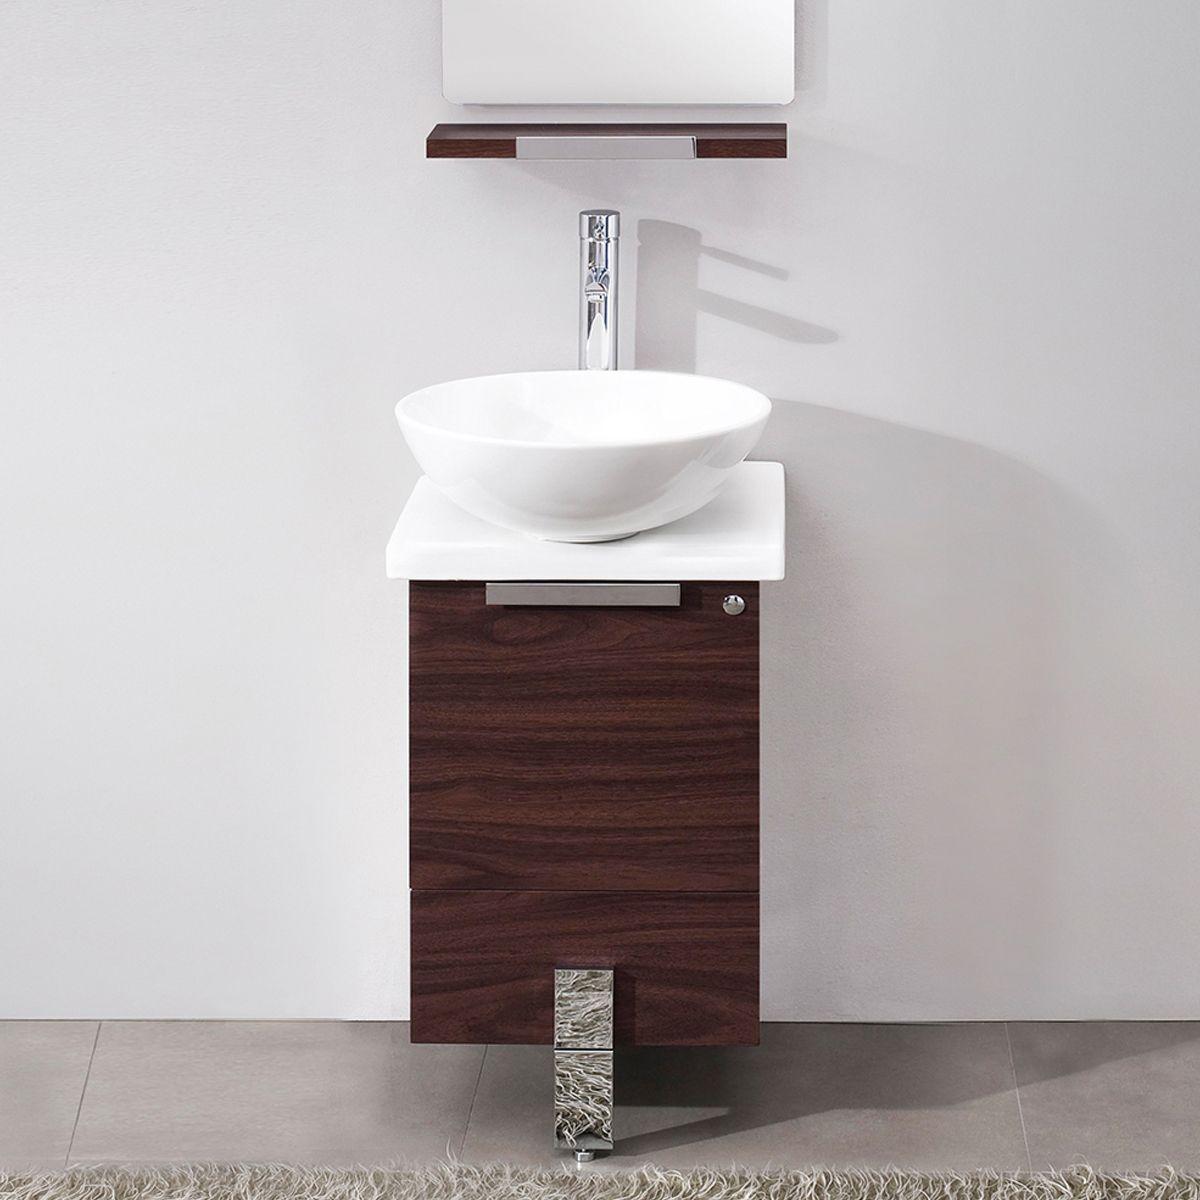 Narrow Bathroom Vanities with 818 Inches of Depth